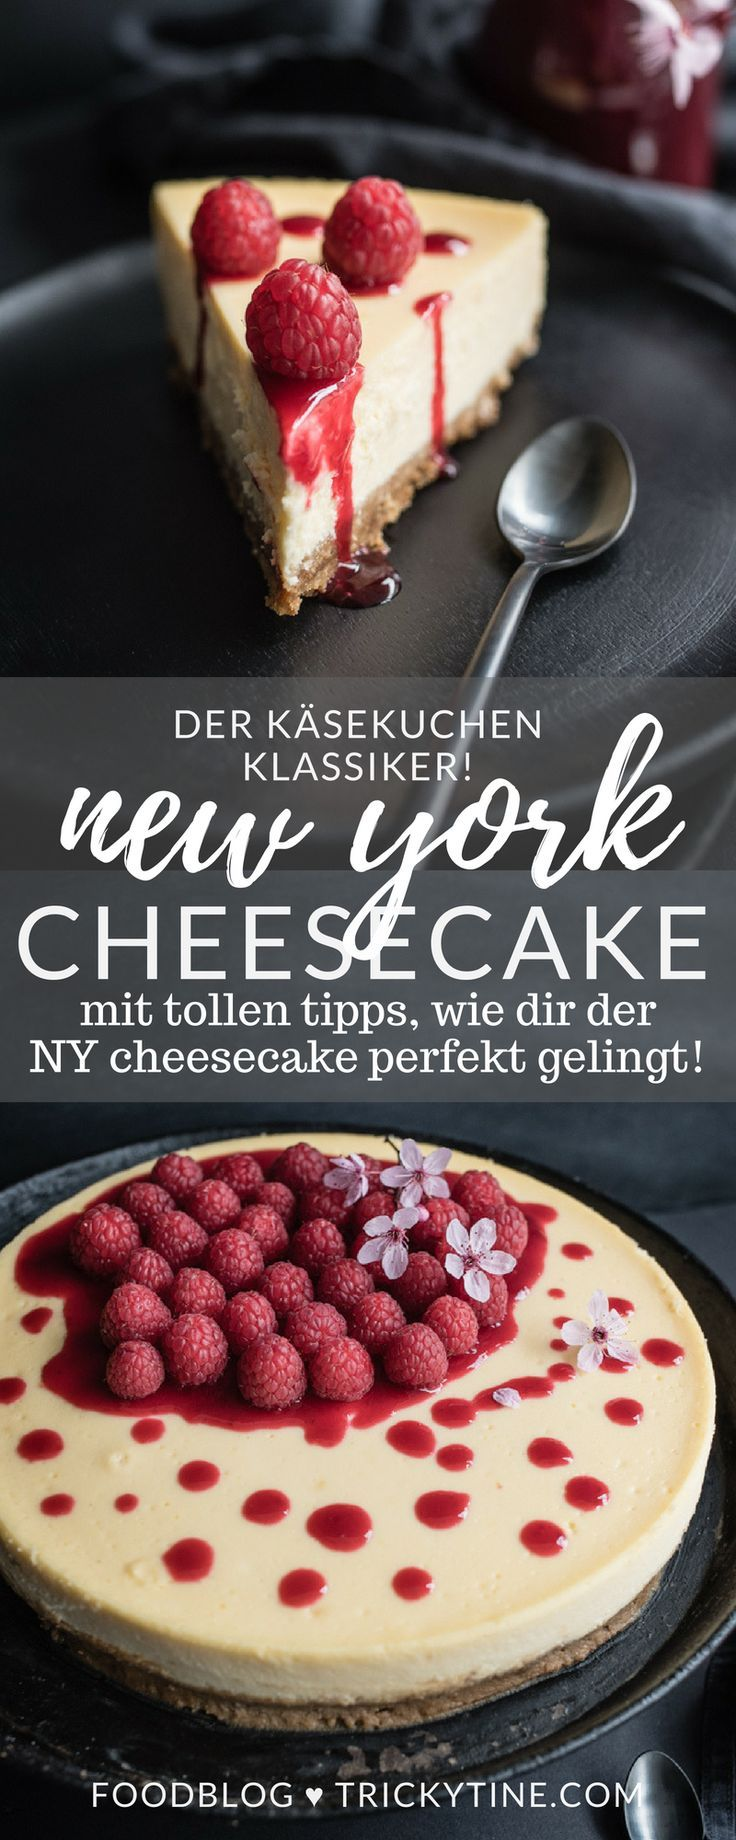 Super cremiger NY Cheesecake mit Himbeersauce